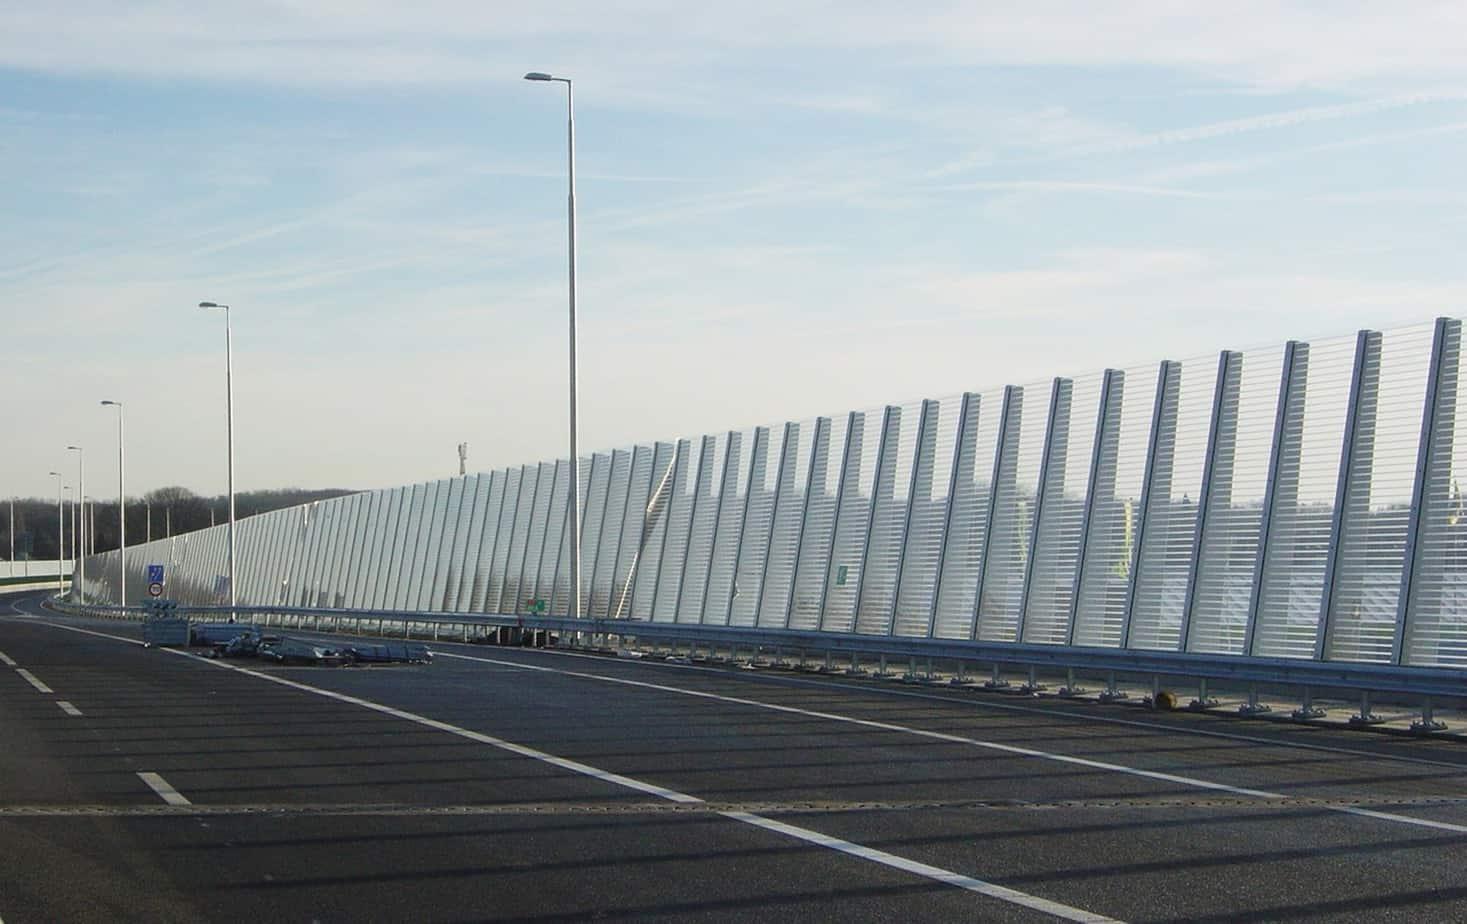 Una barriera antirumore tradizionale